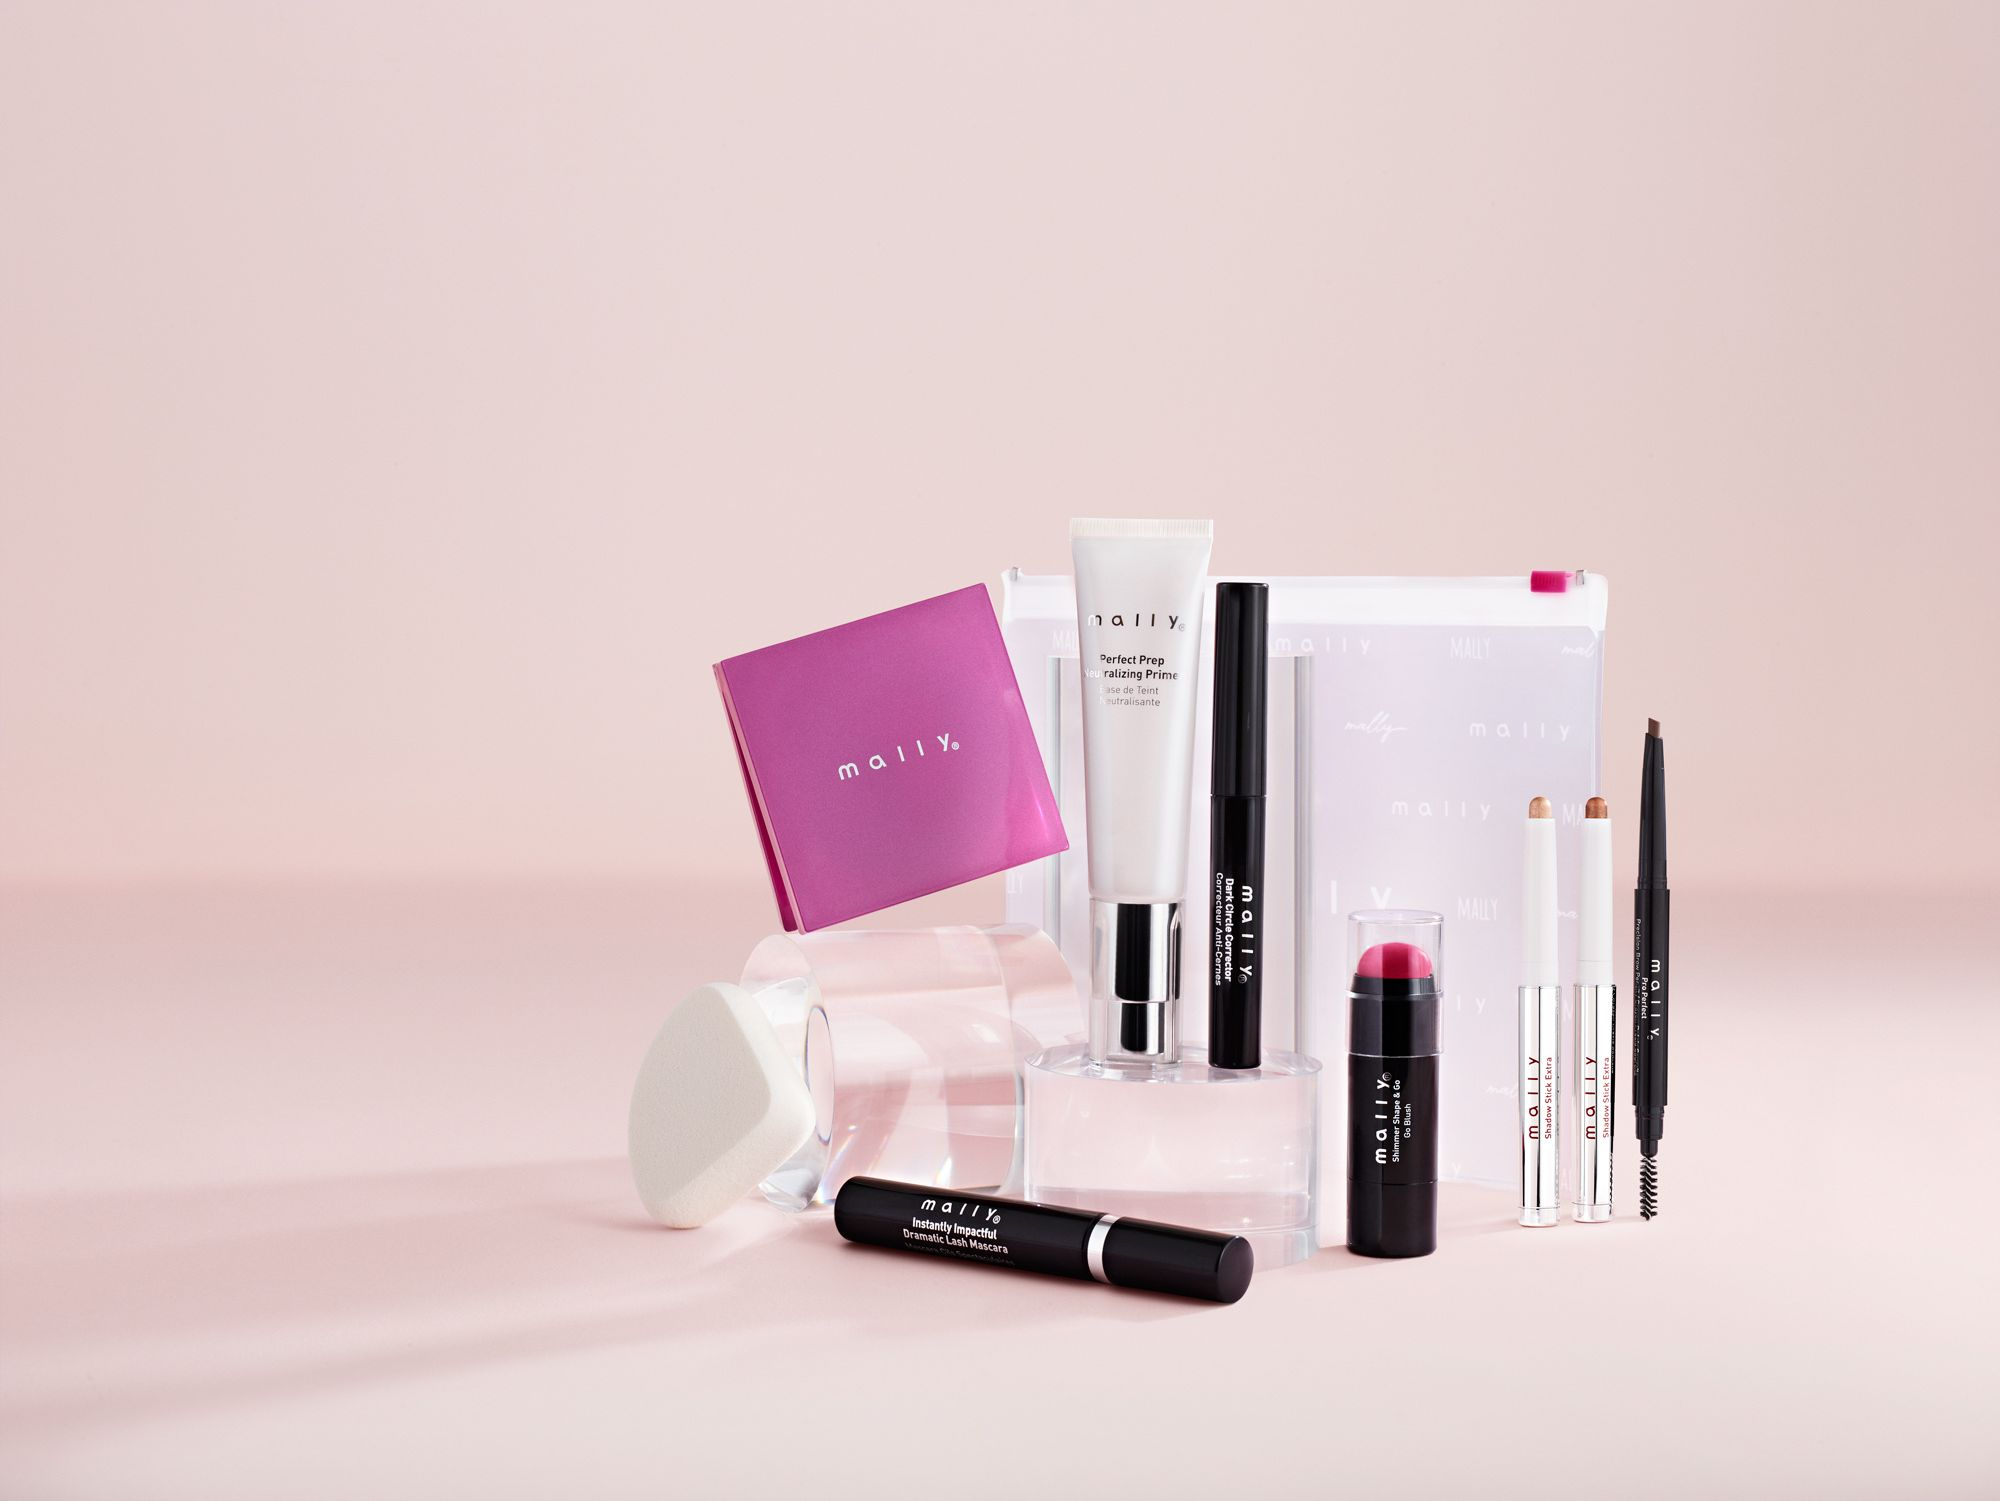 Mally Beauty Circle of Light makeup kits